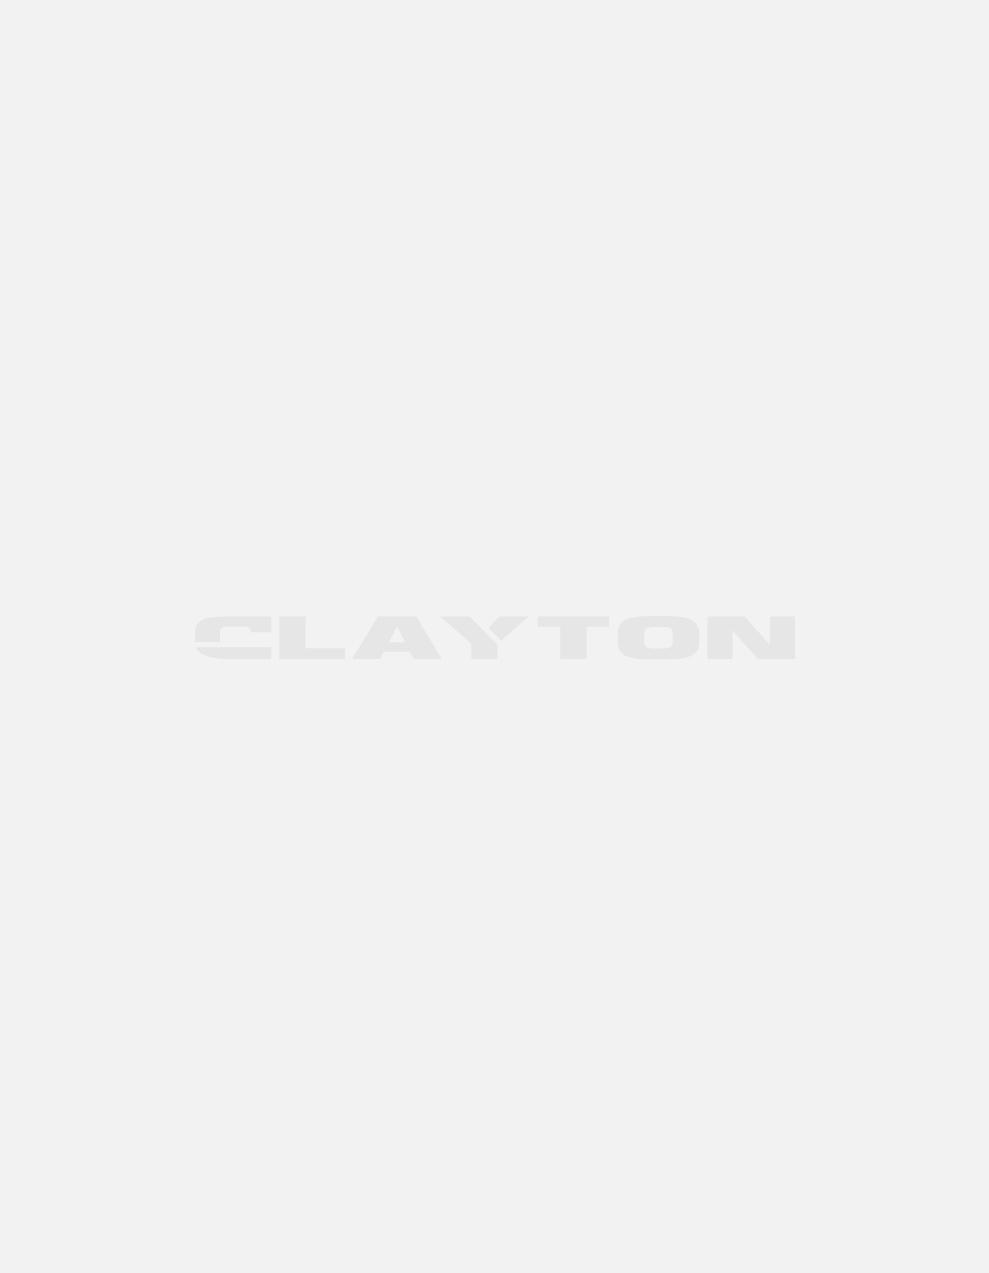 https://www.claytonitalia.com/media/catalog/product/cache/5/small_image/460x590/9df78eab33525d08d6e5fb8d27136e95/g/i/gift55_nt.jpg